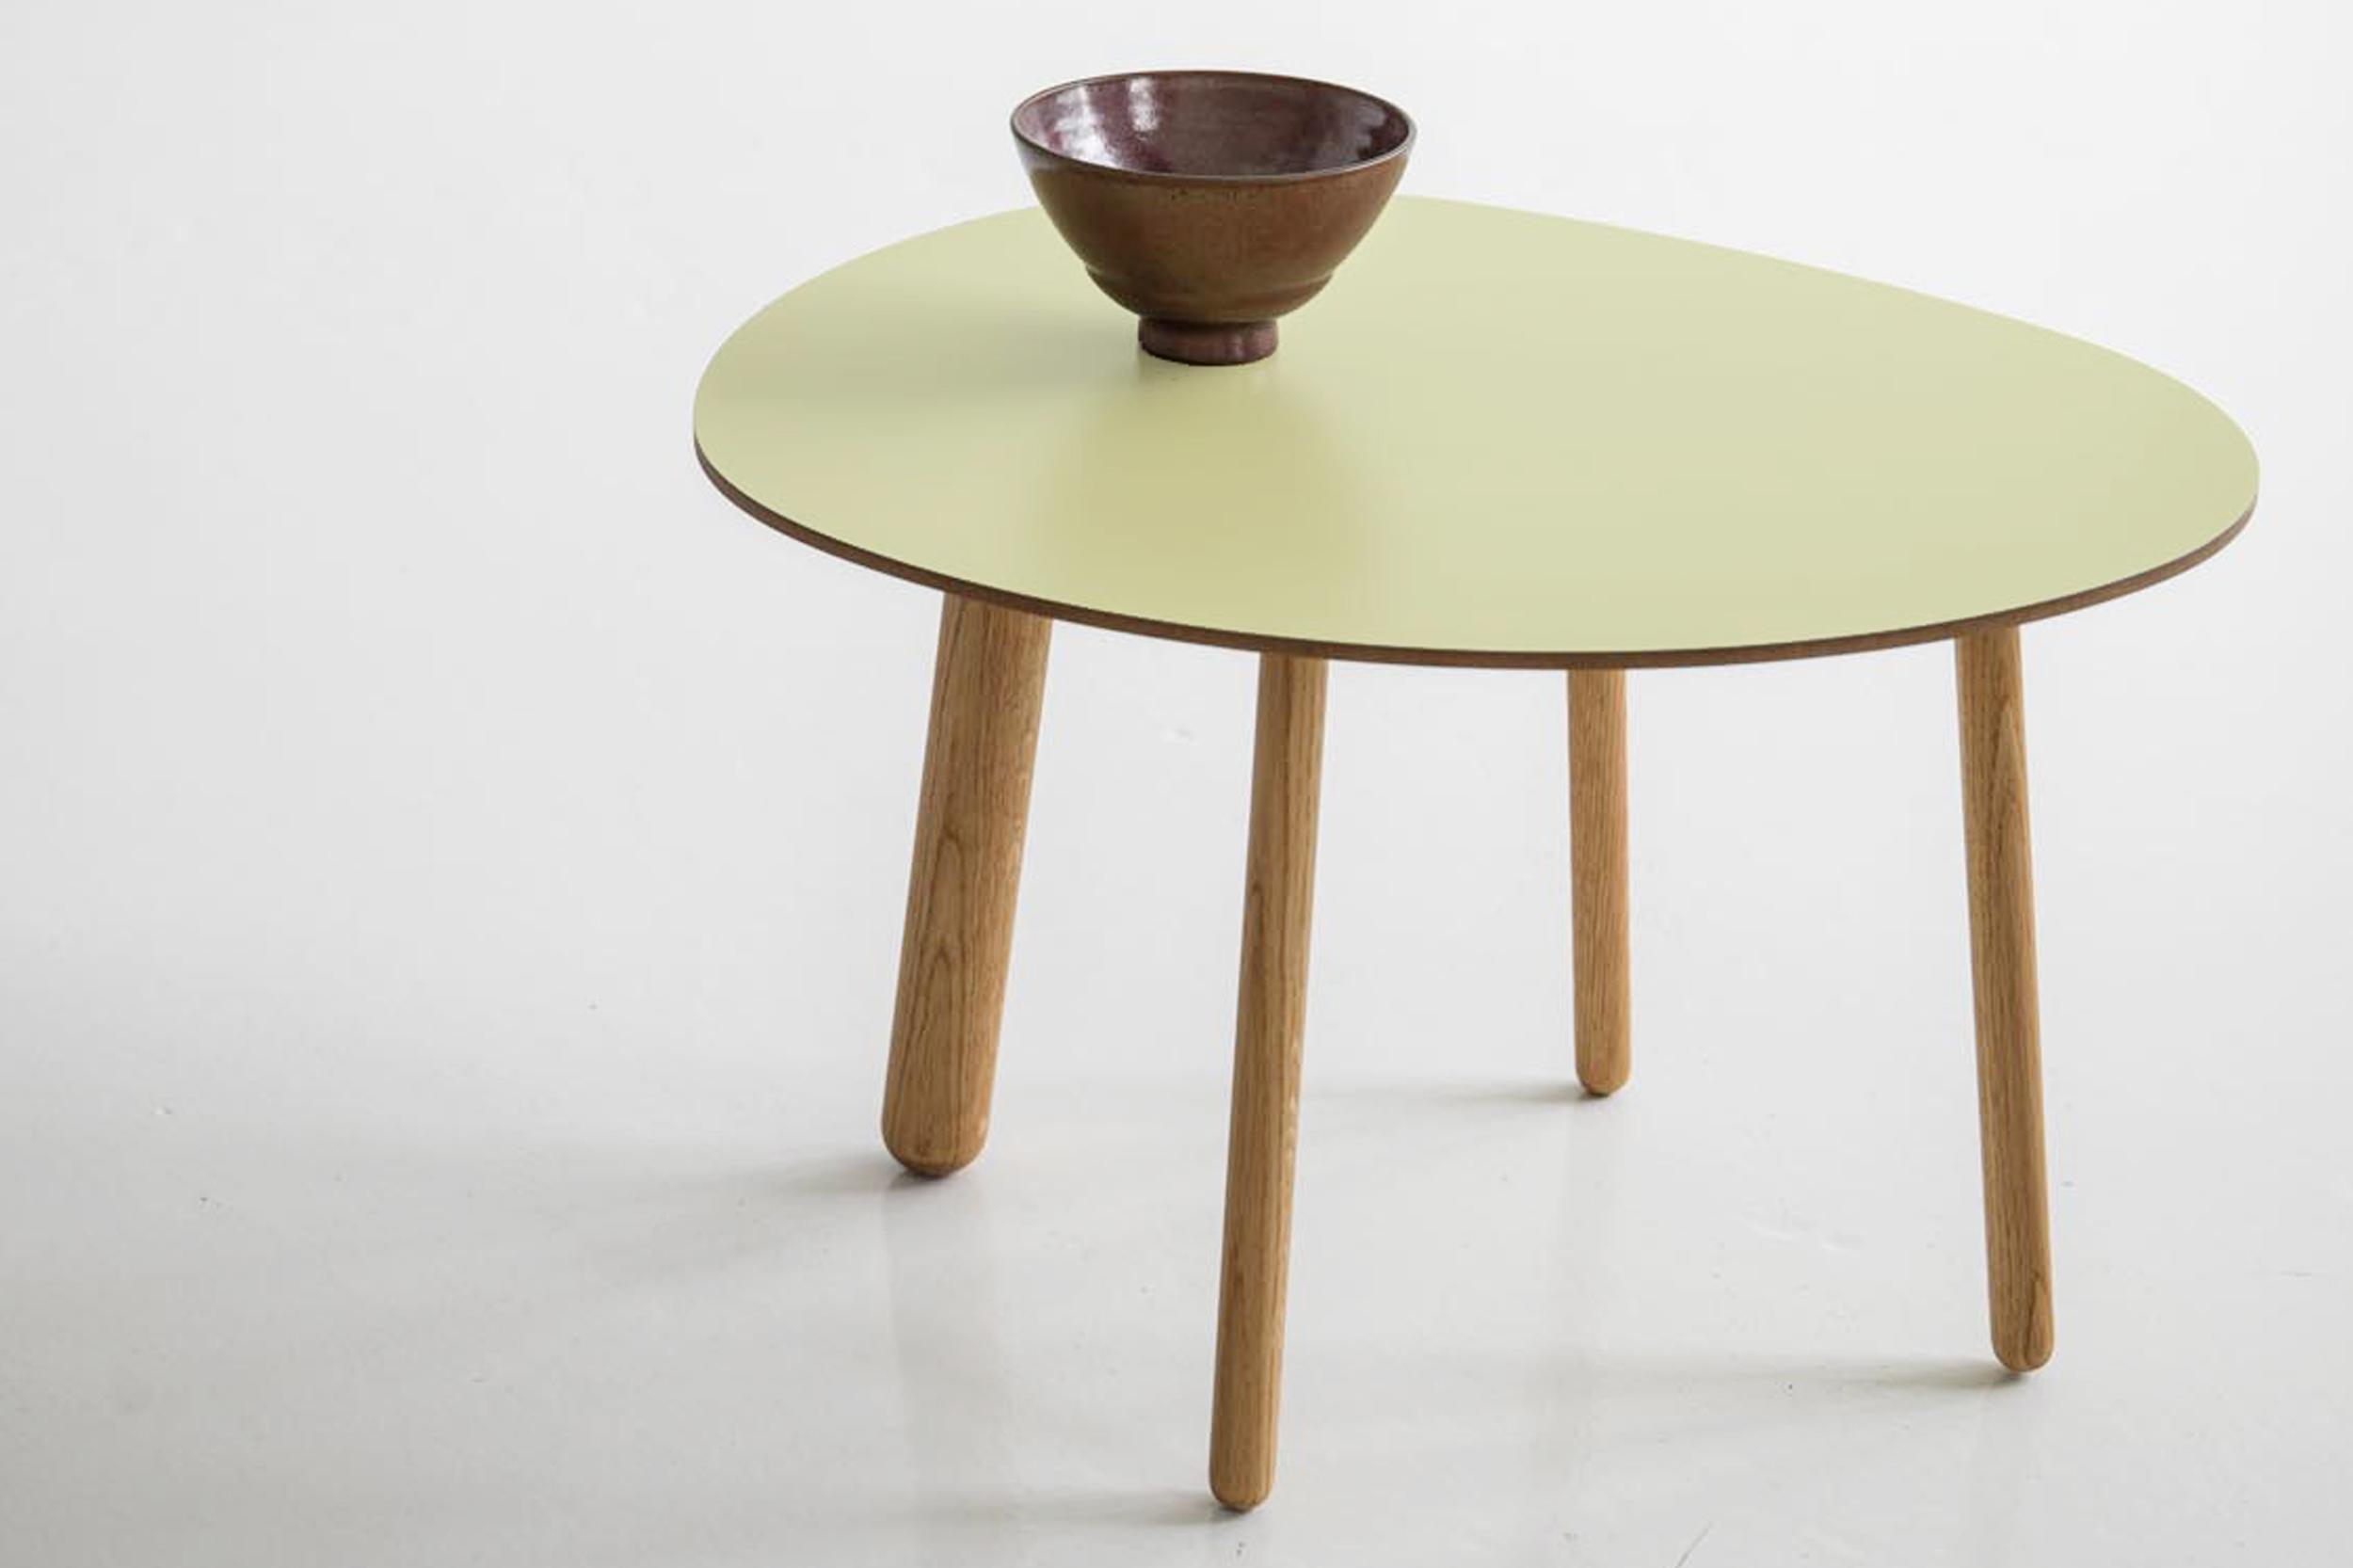 Morris coffee table model 1 in matte pale green